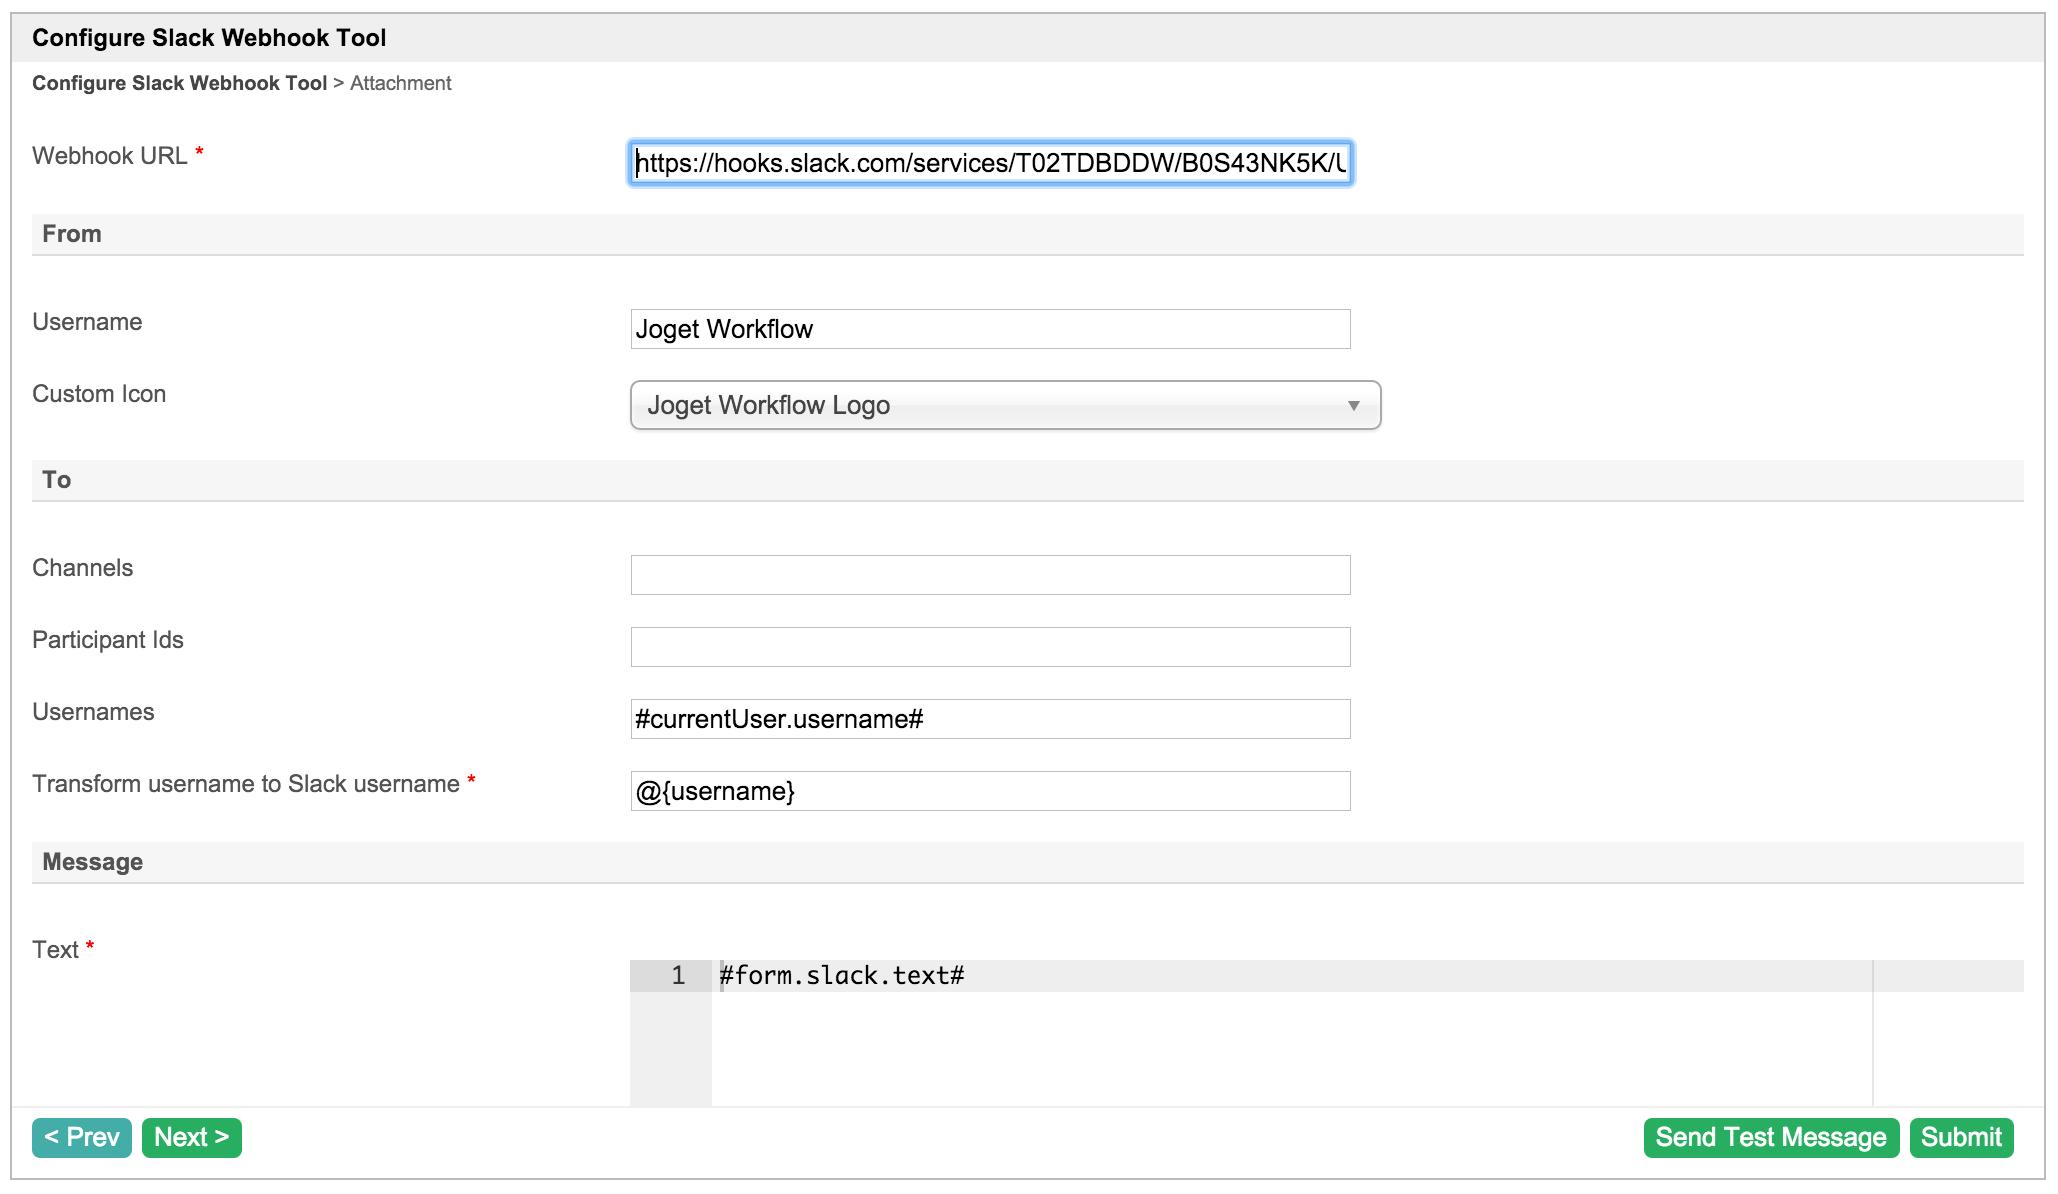 How to develop a Slack Webhook Tool - Knowledge Base for v5